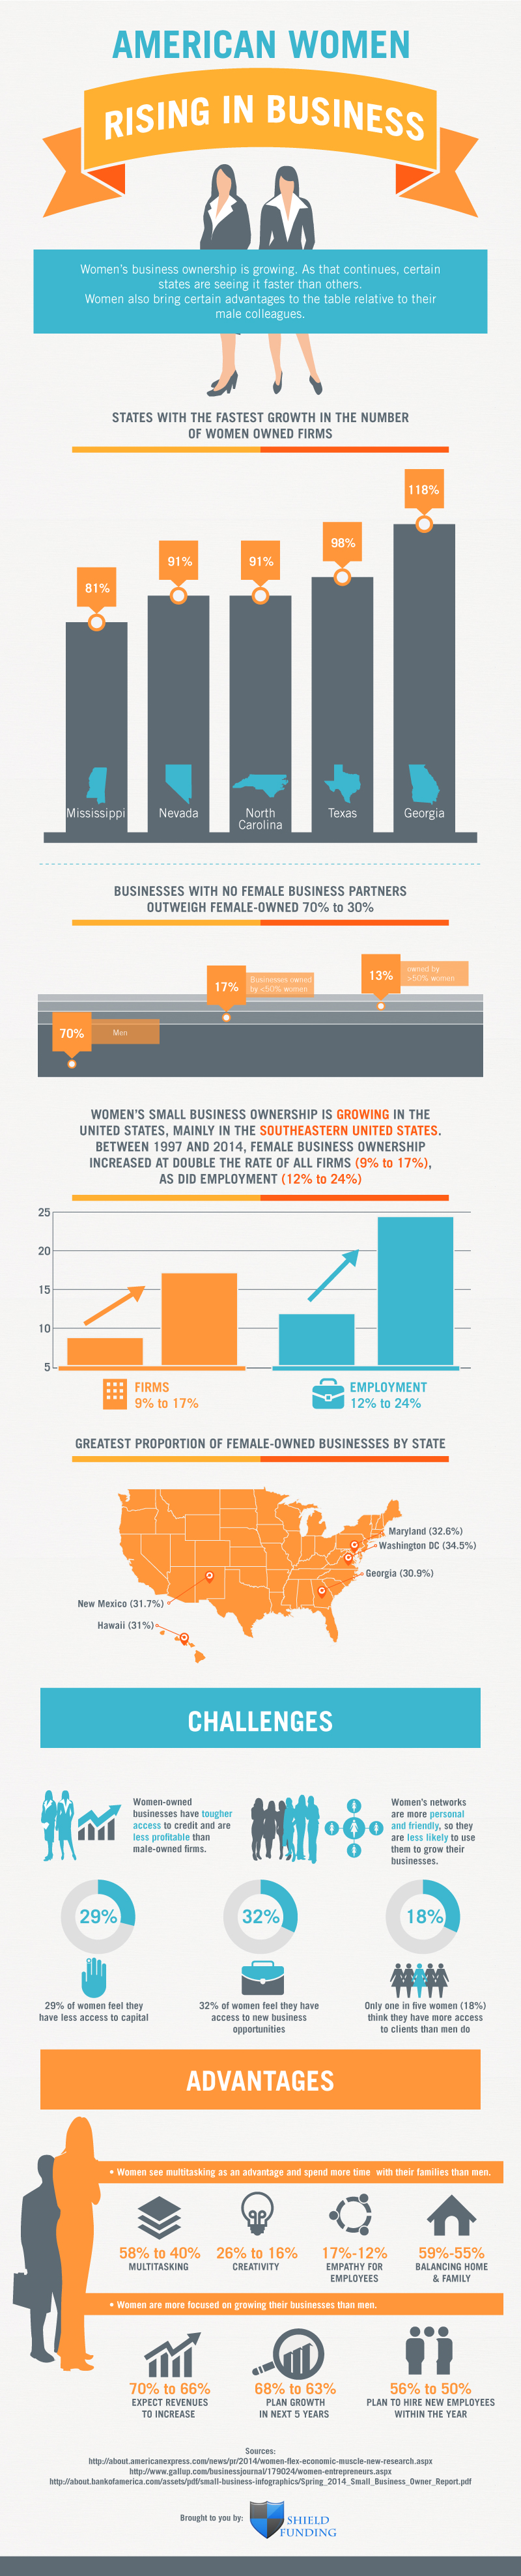 American Women Rising in Business